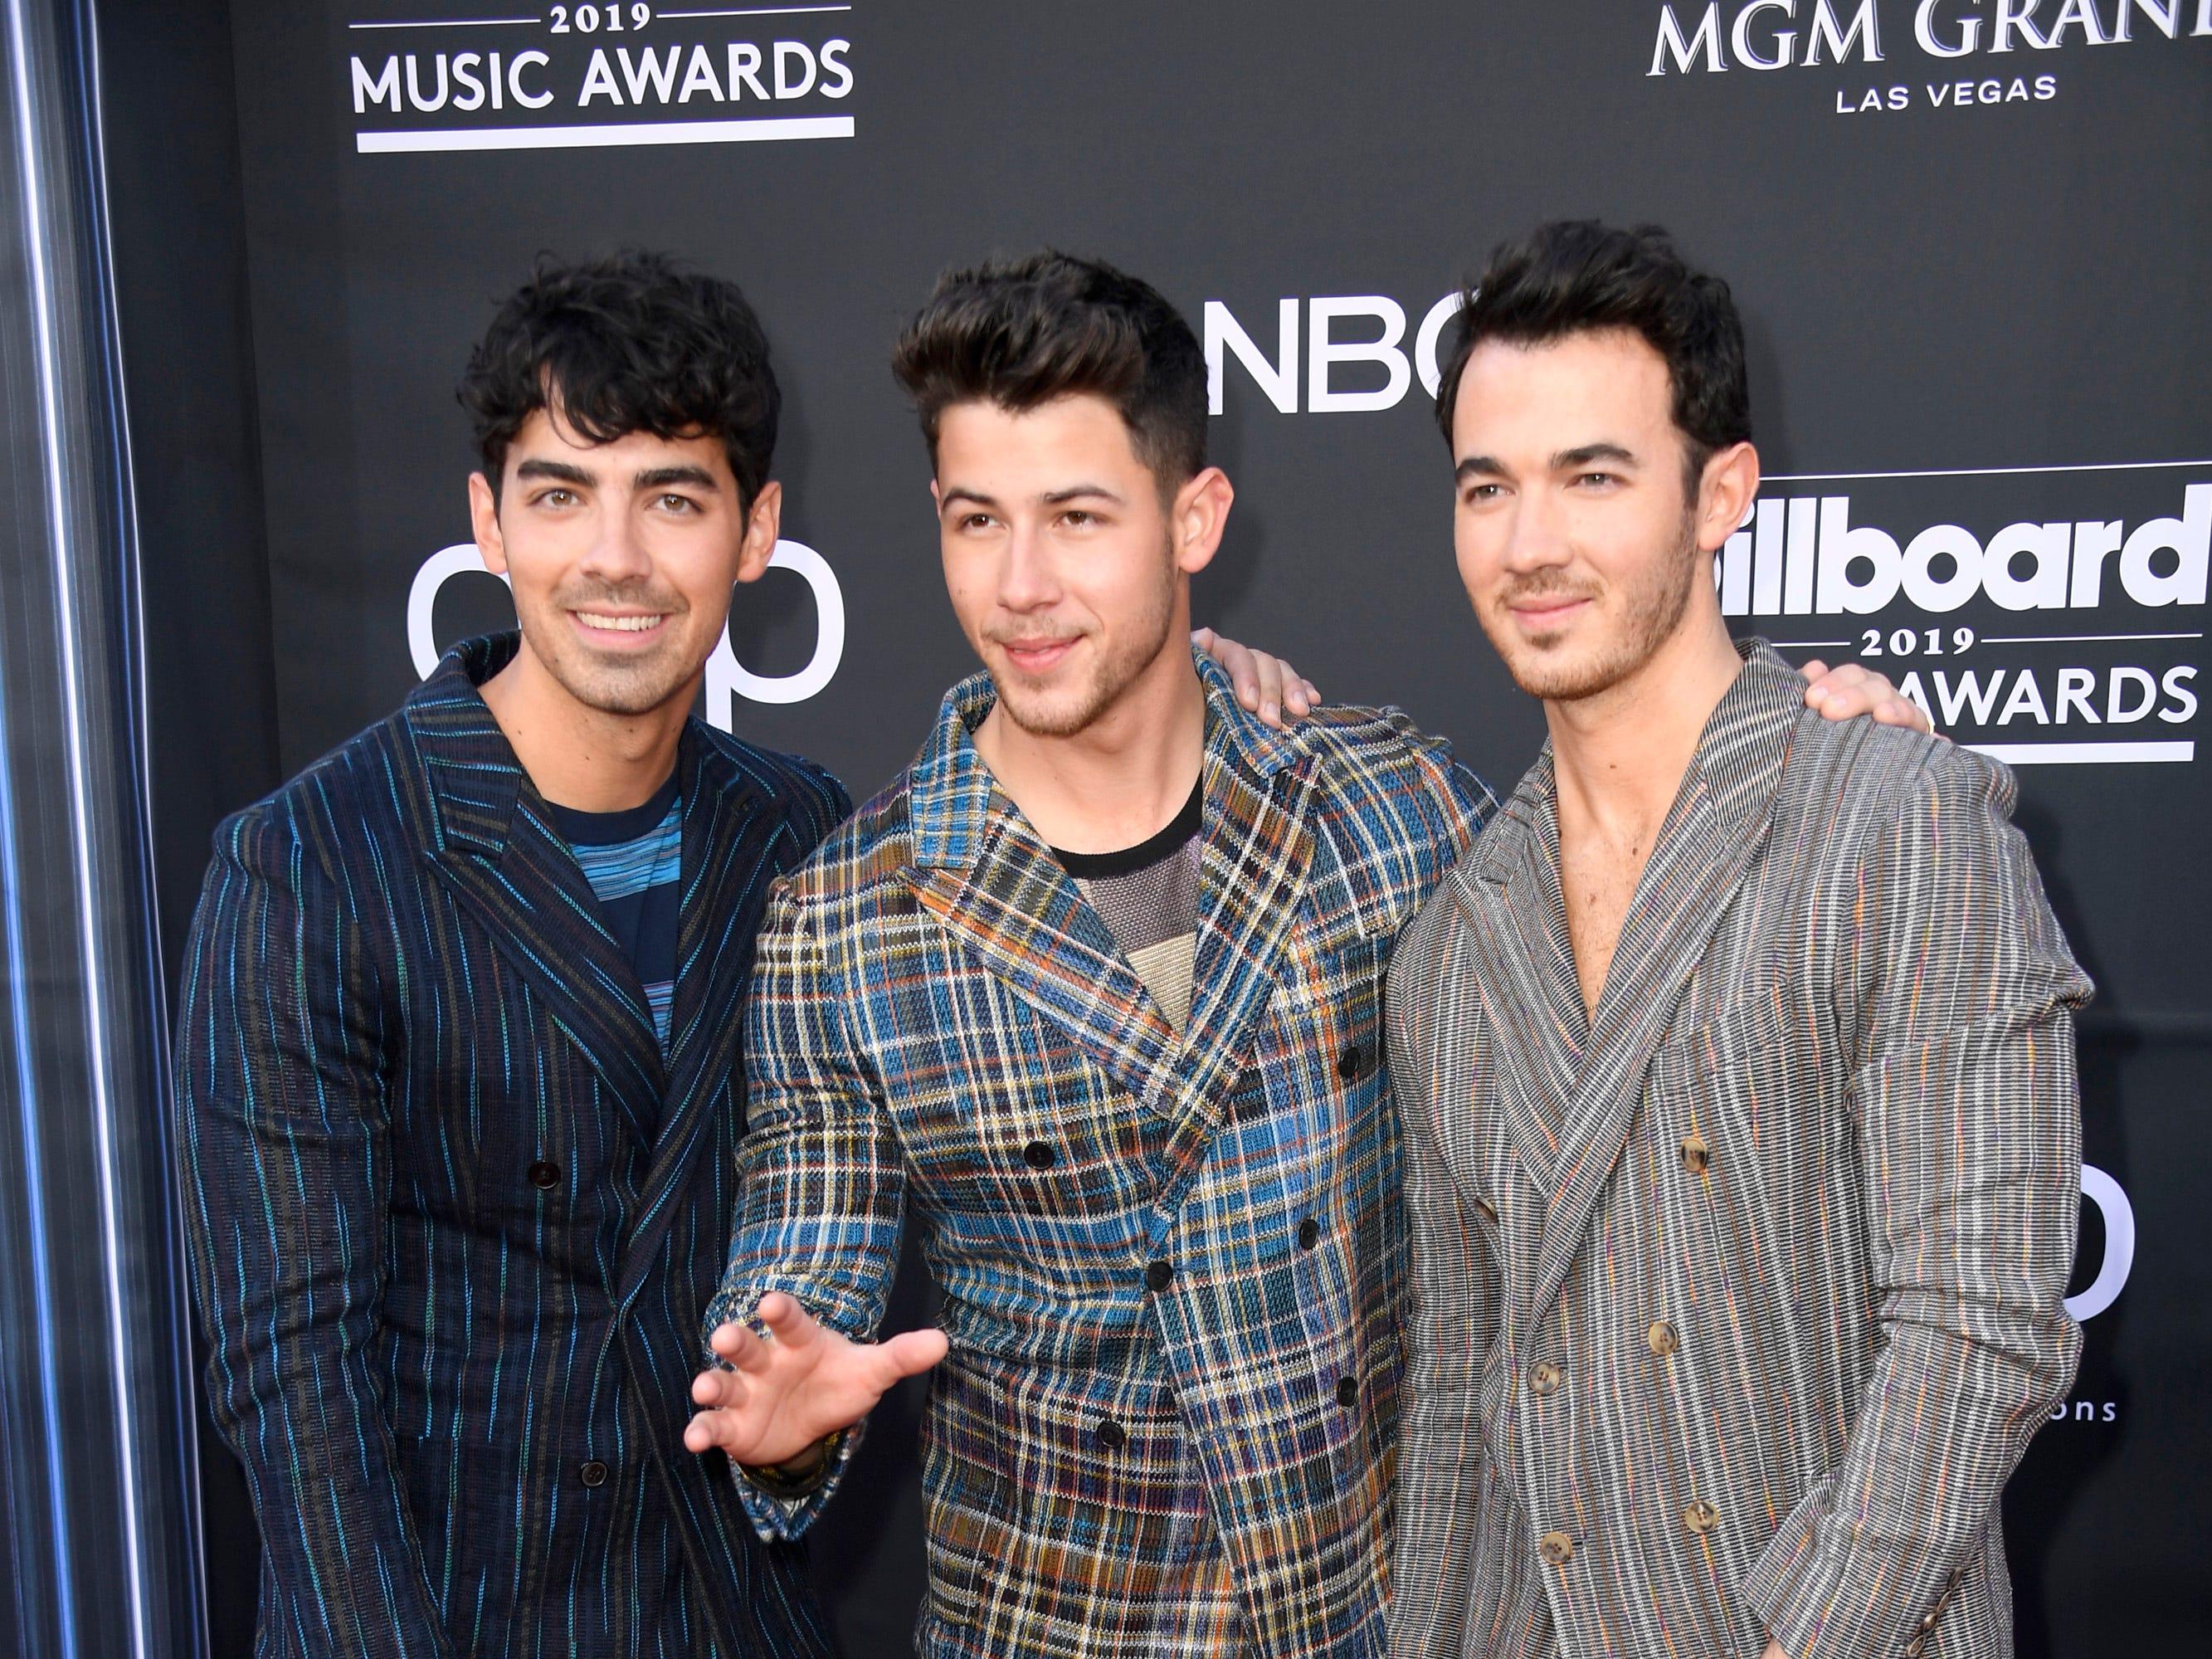 (L-R) Joe Jonas, Nick Jonas, and Kevin Jonas of Jonas Brothers attend the 2019 Billboard Music Awards at MGM Grand Garden Arena on May 01, 2019 in Las Vegas, Nevada.